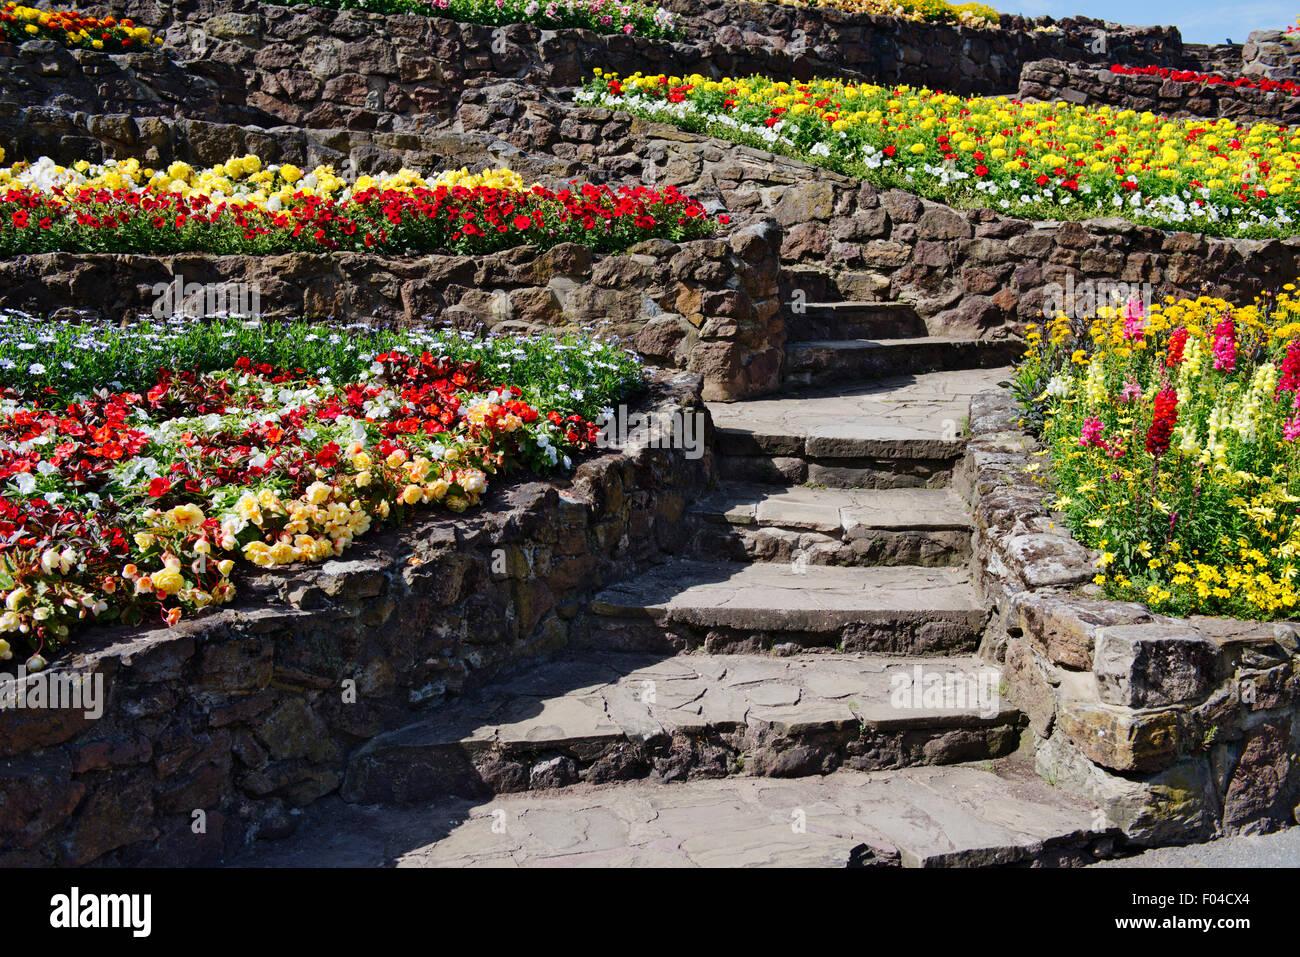 Terrasse Jardin Fleuri